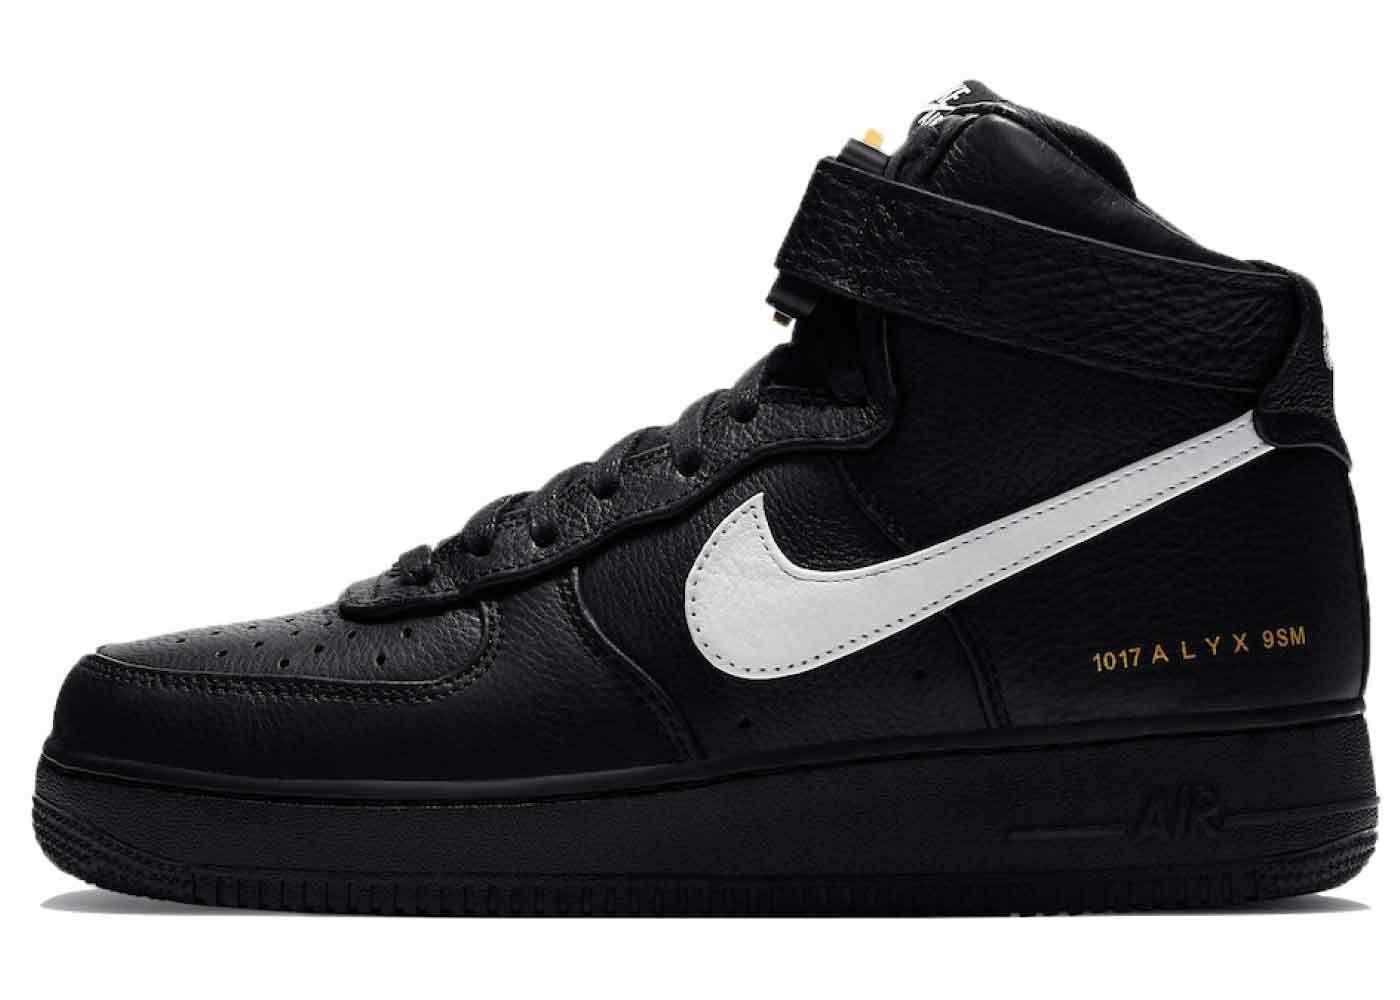 Alyx x Nike Air Force 1 High Black Whiteの写真